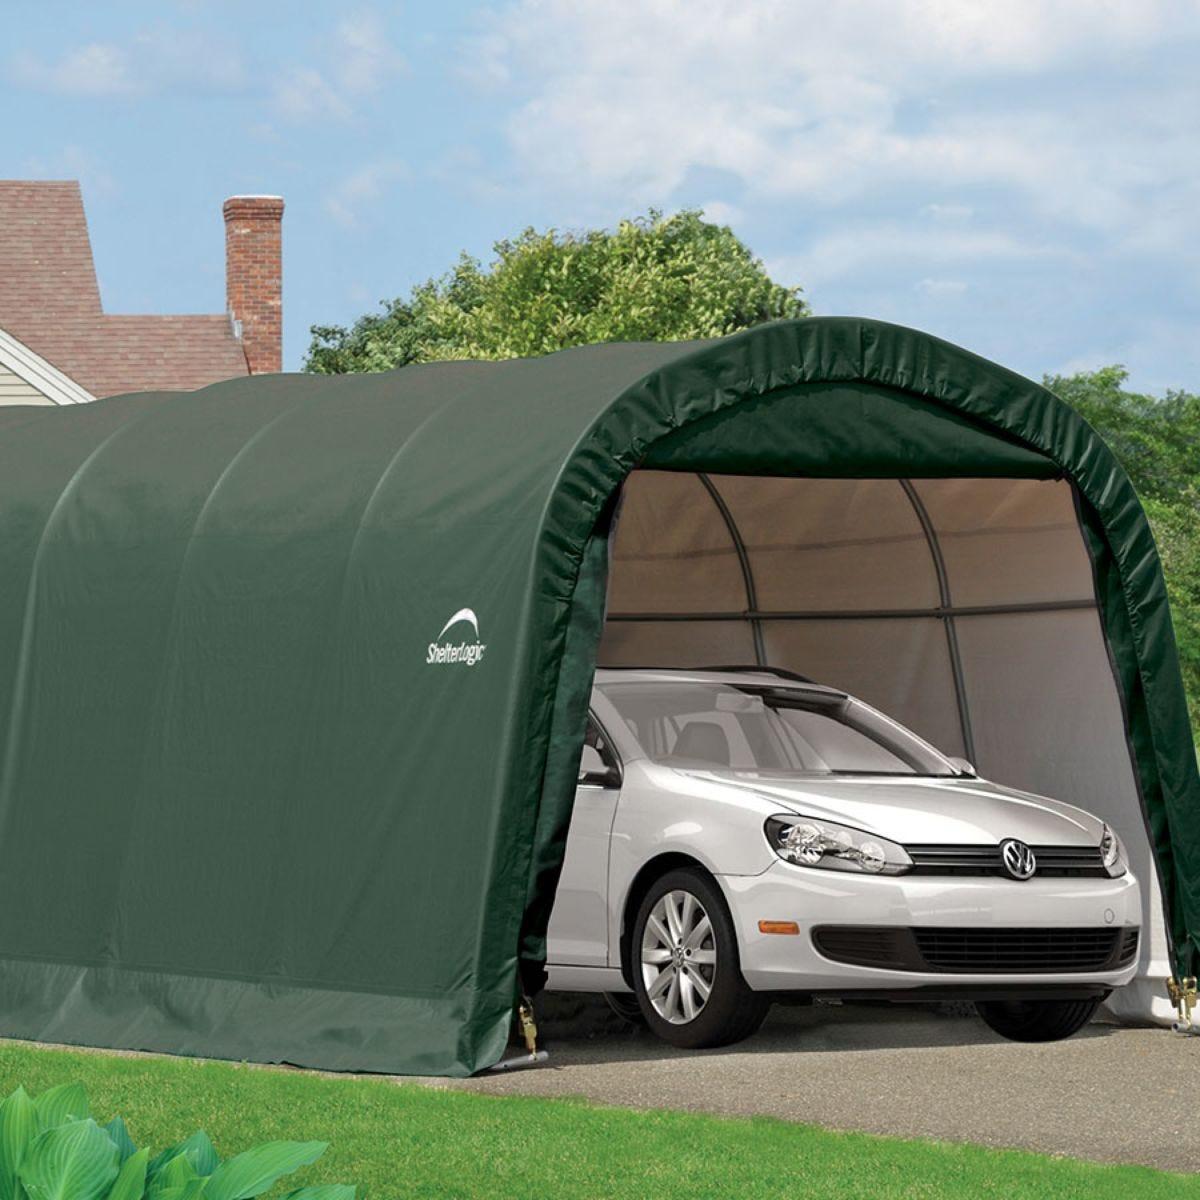 ShelterLogic 10ftx20ft Round Top Auto Shelter